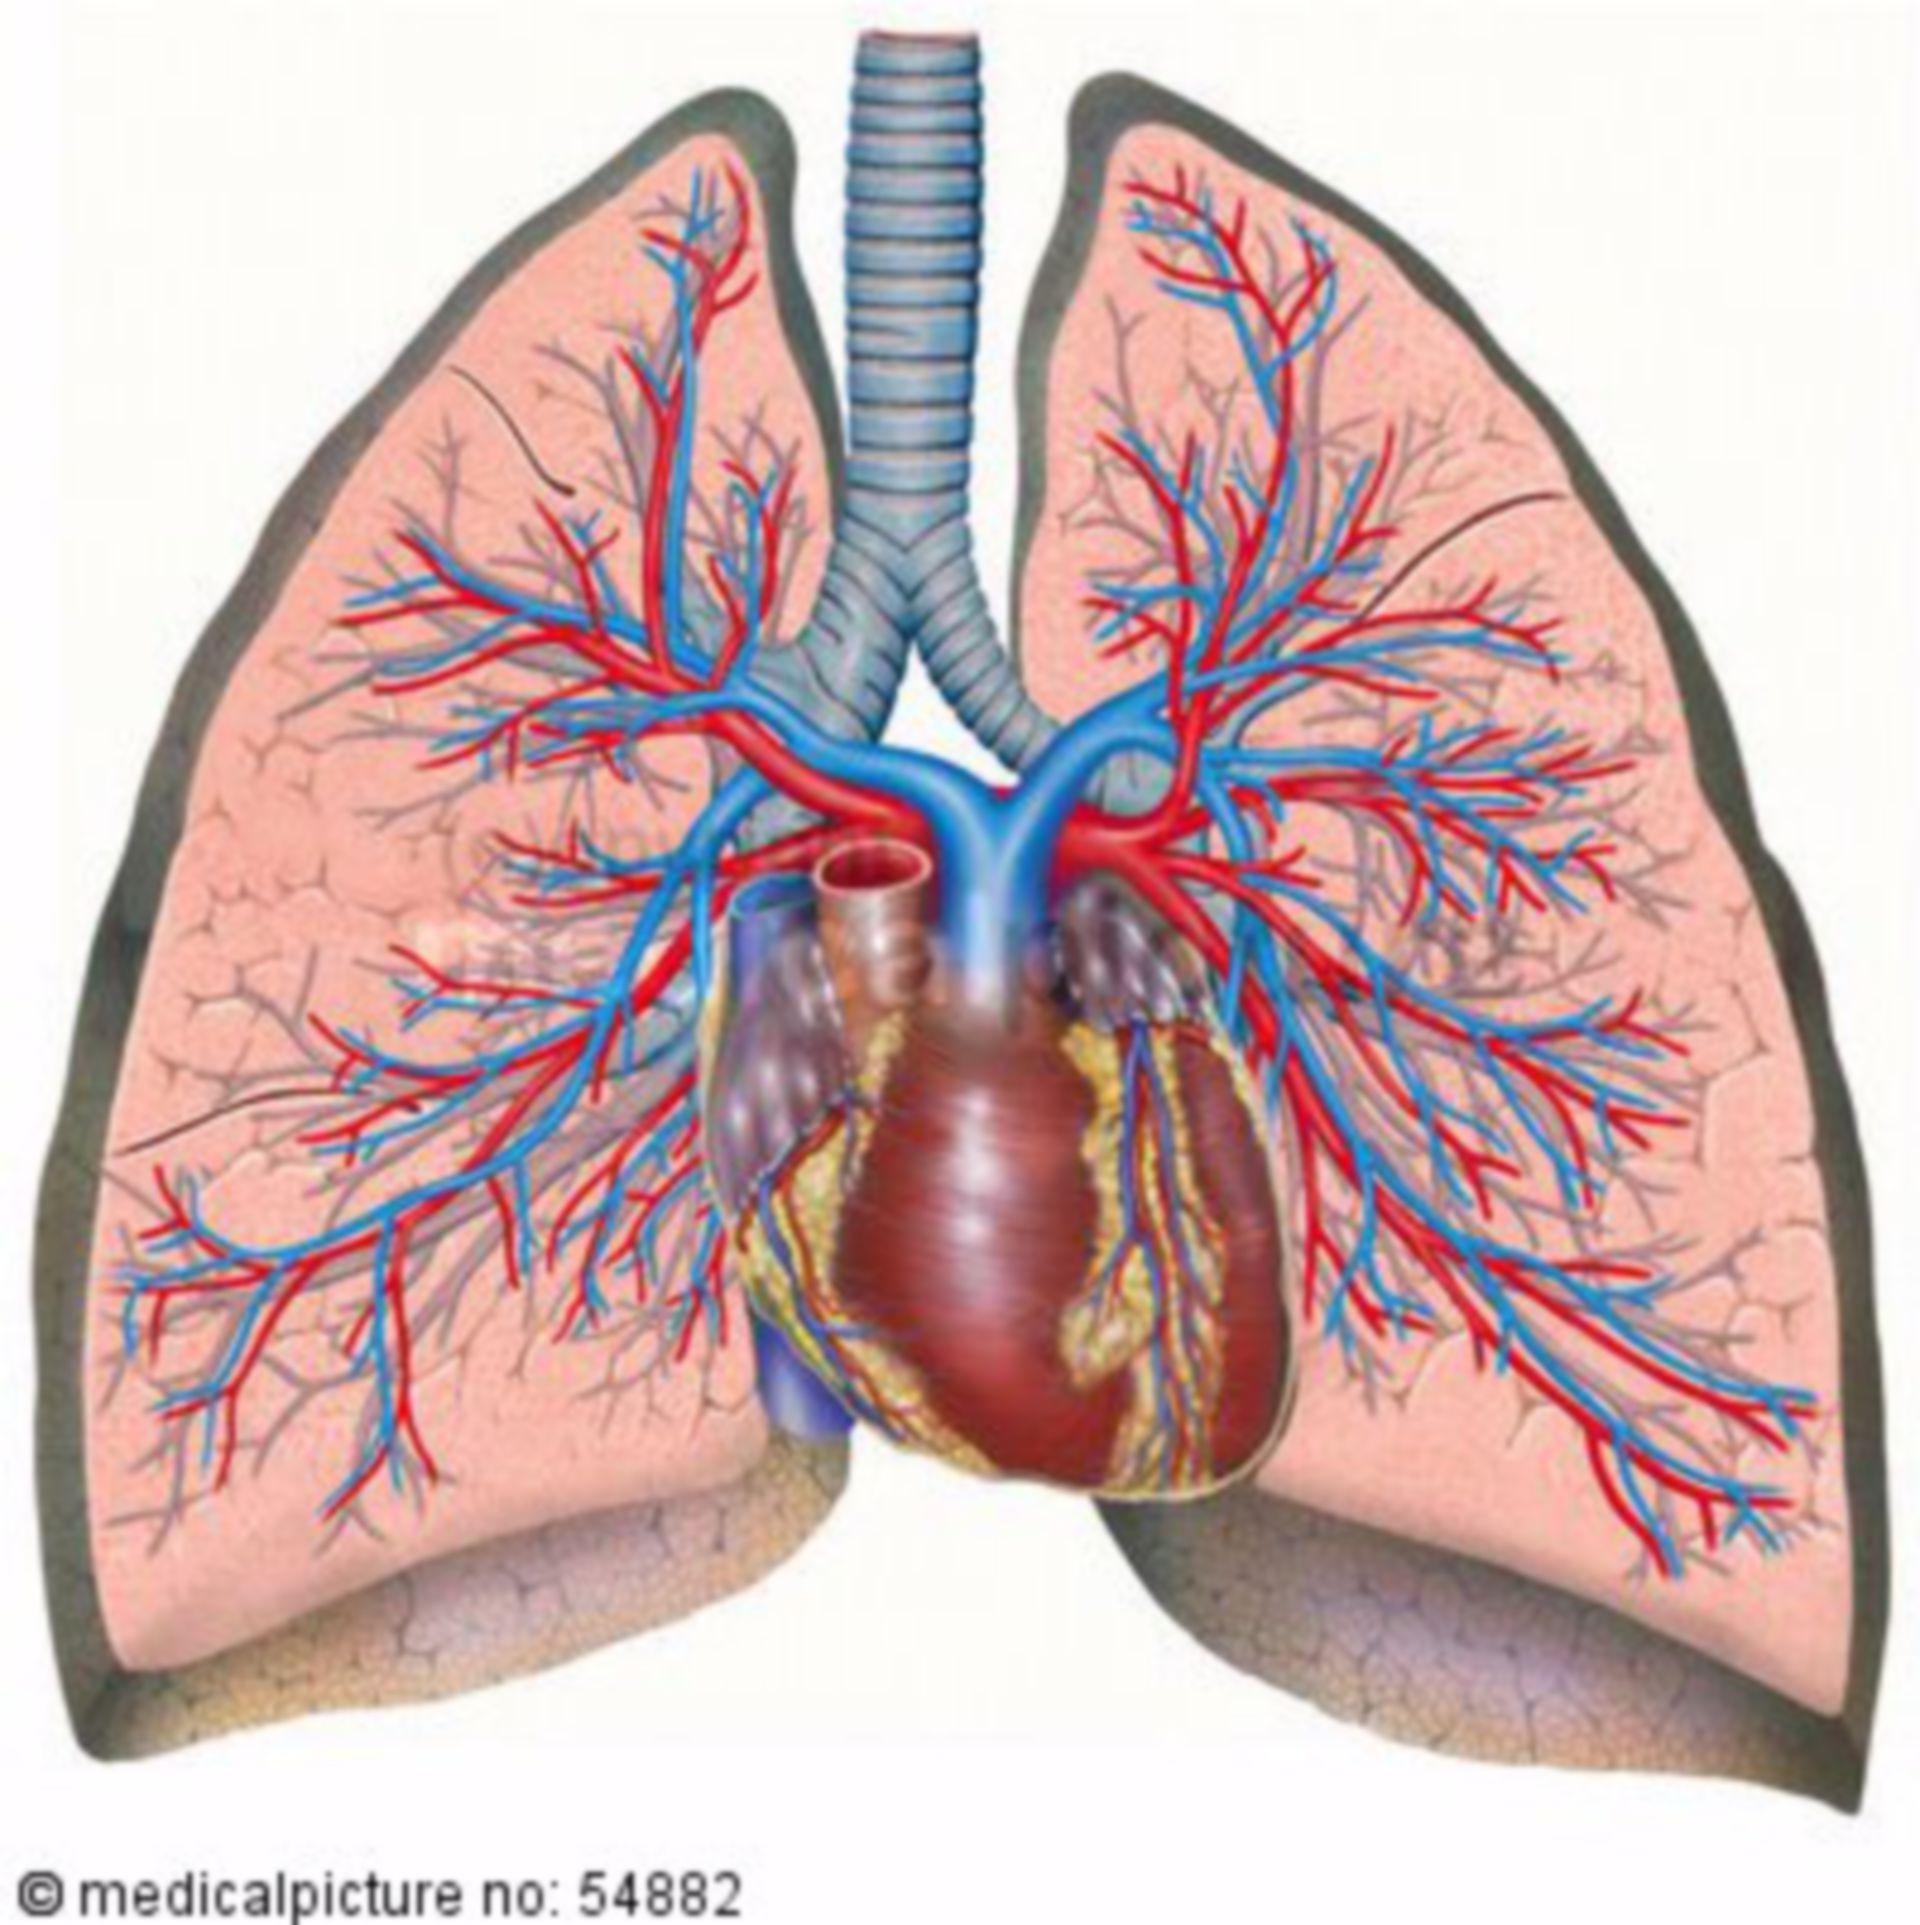 Thoracic organs